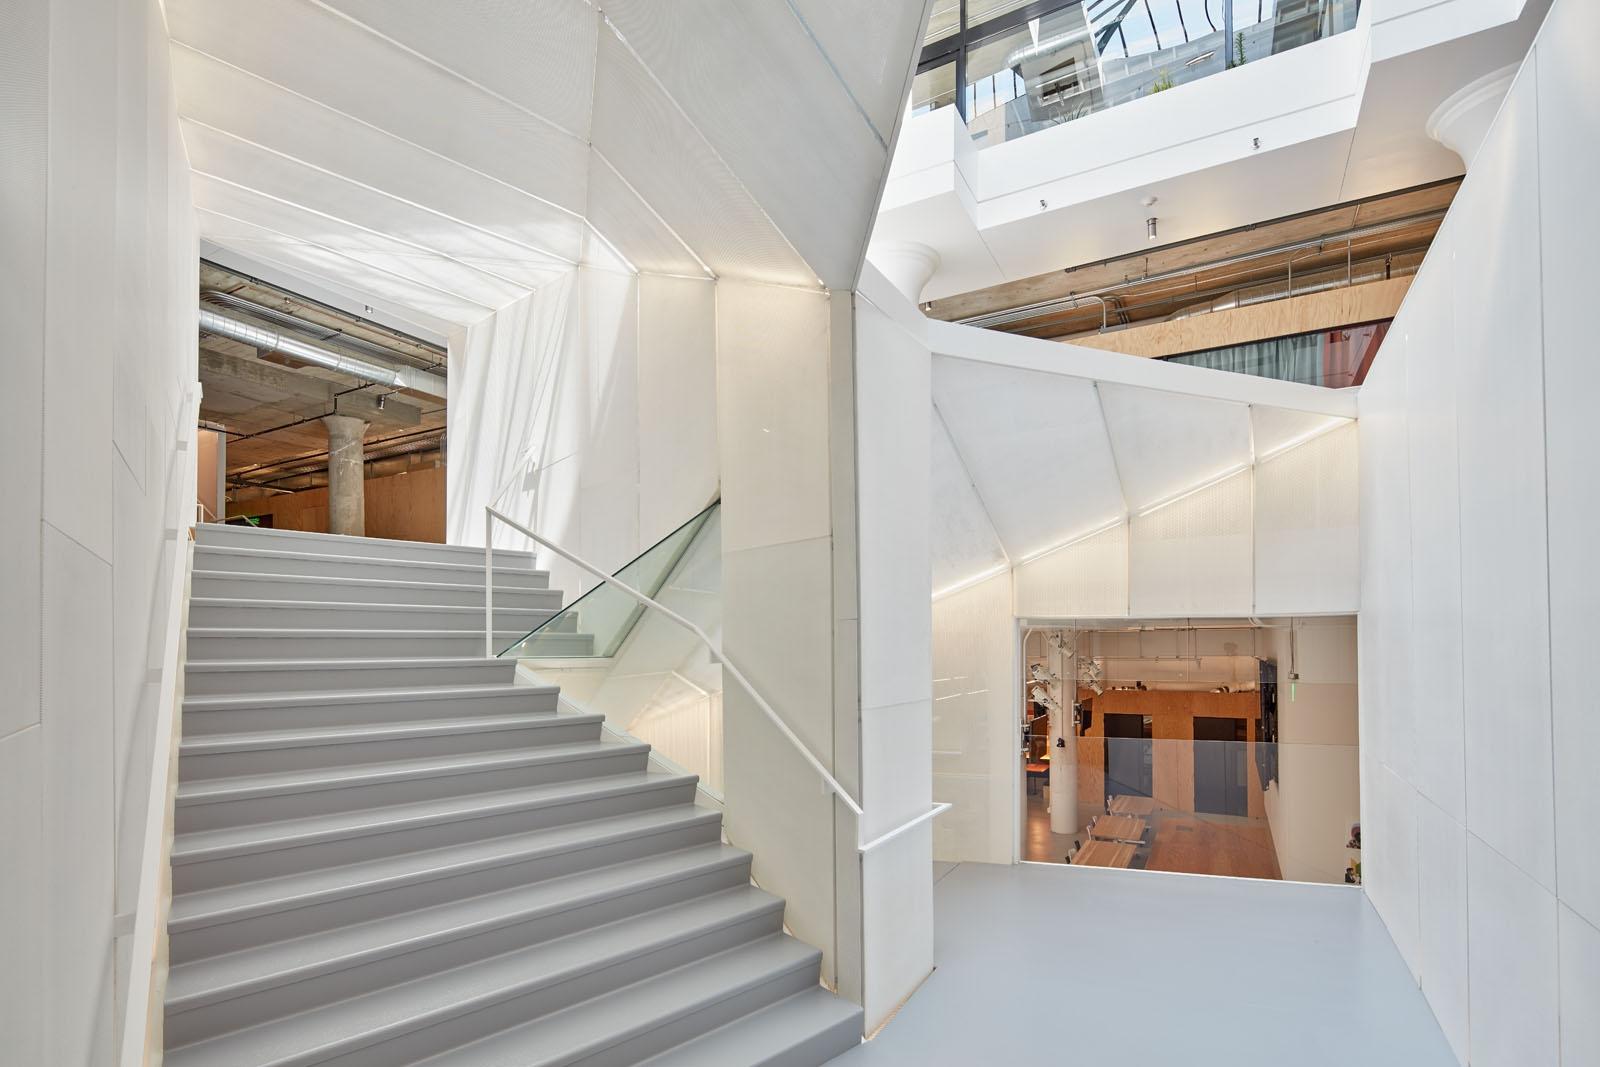 Pinterest Headquarters Knitted Stair Atrium